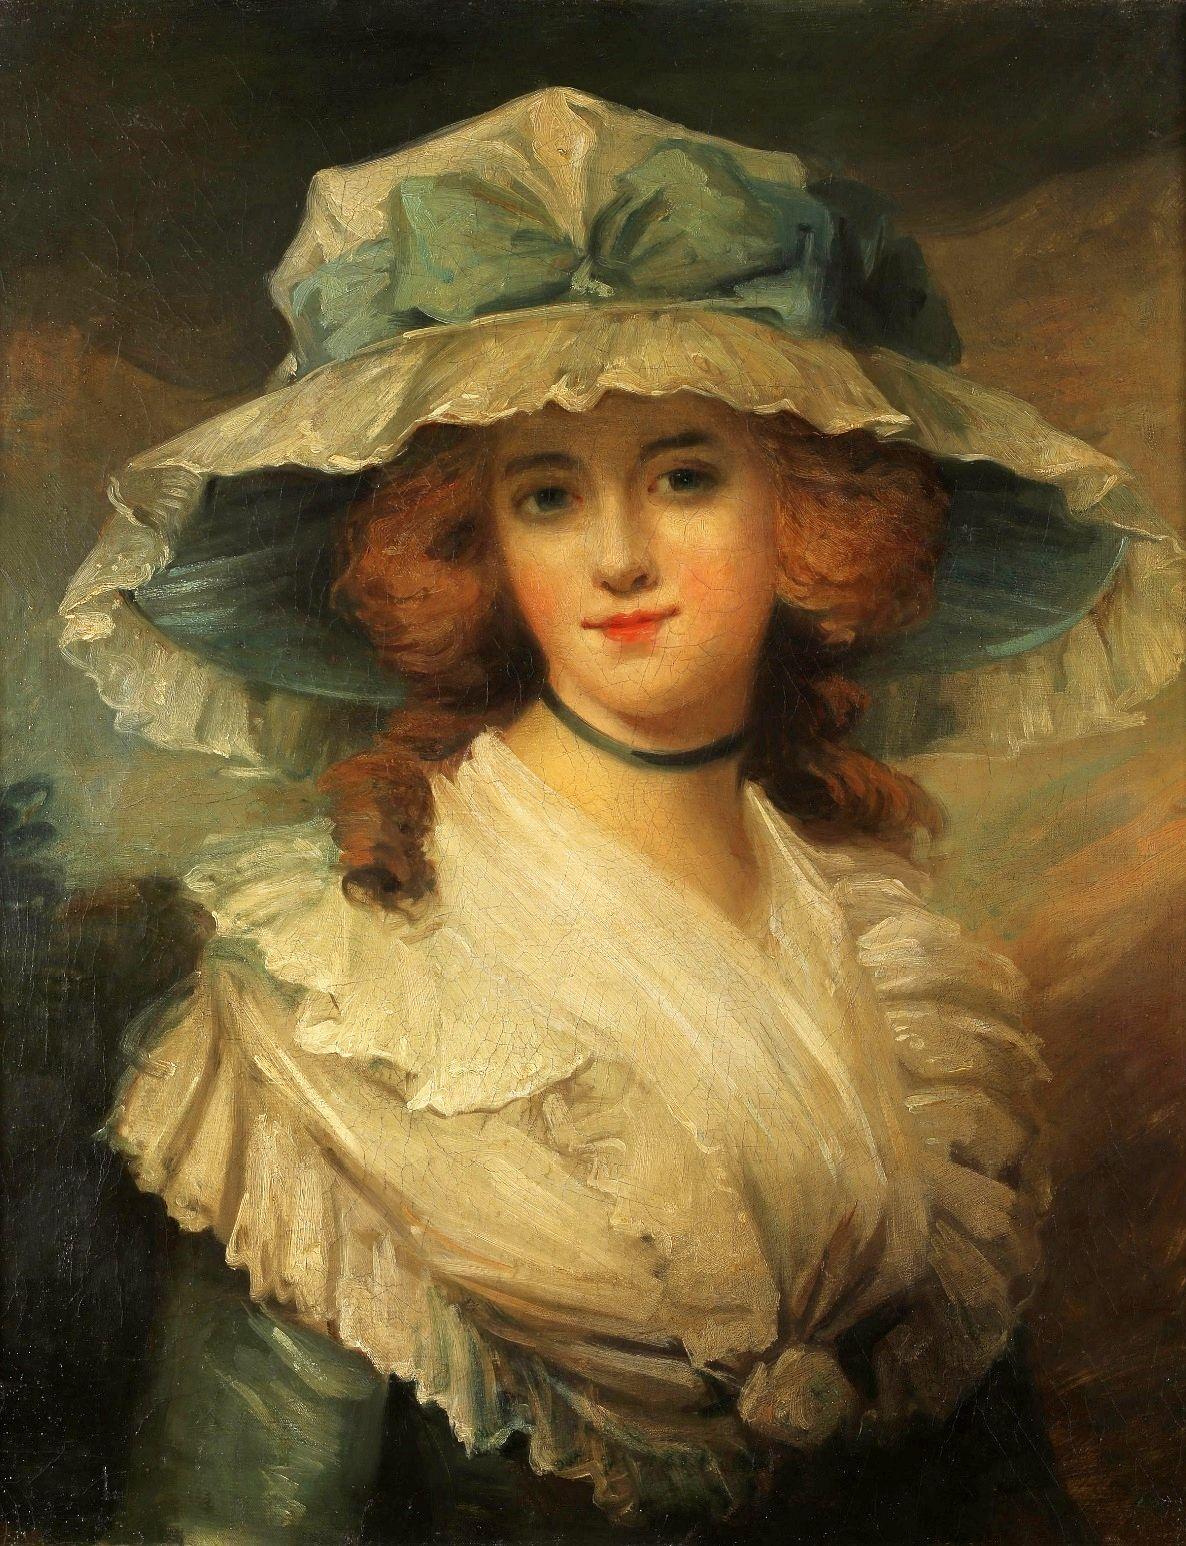 Portrait of a lady by George Romney, 4th quarter of the 18th century (PD-art/old), Zamek w Pieskowej Skale